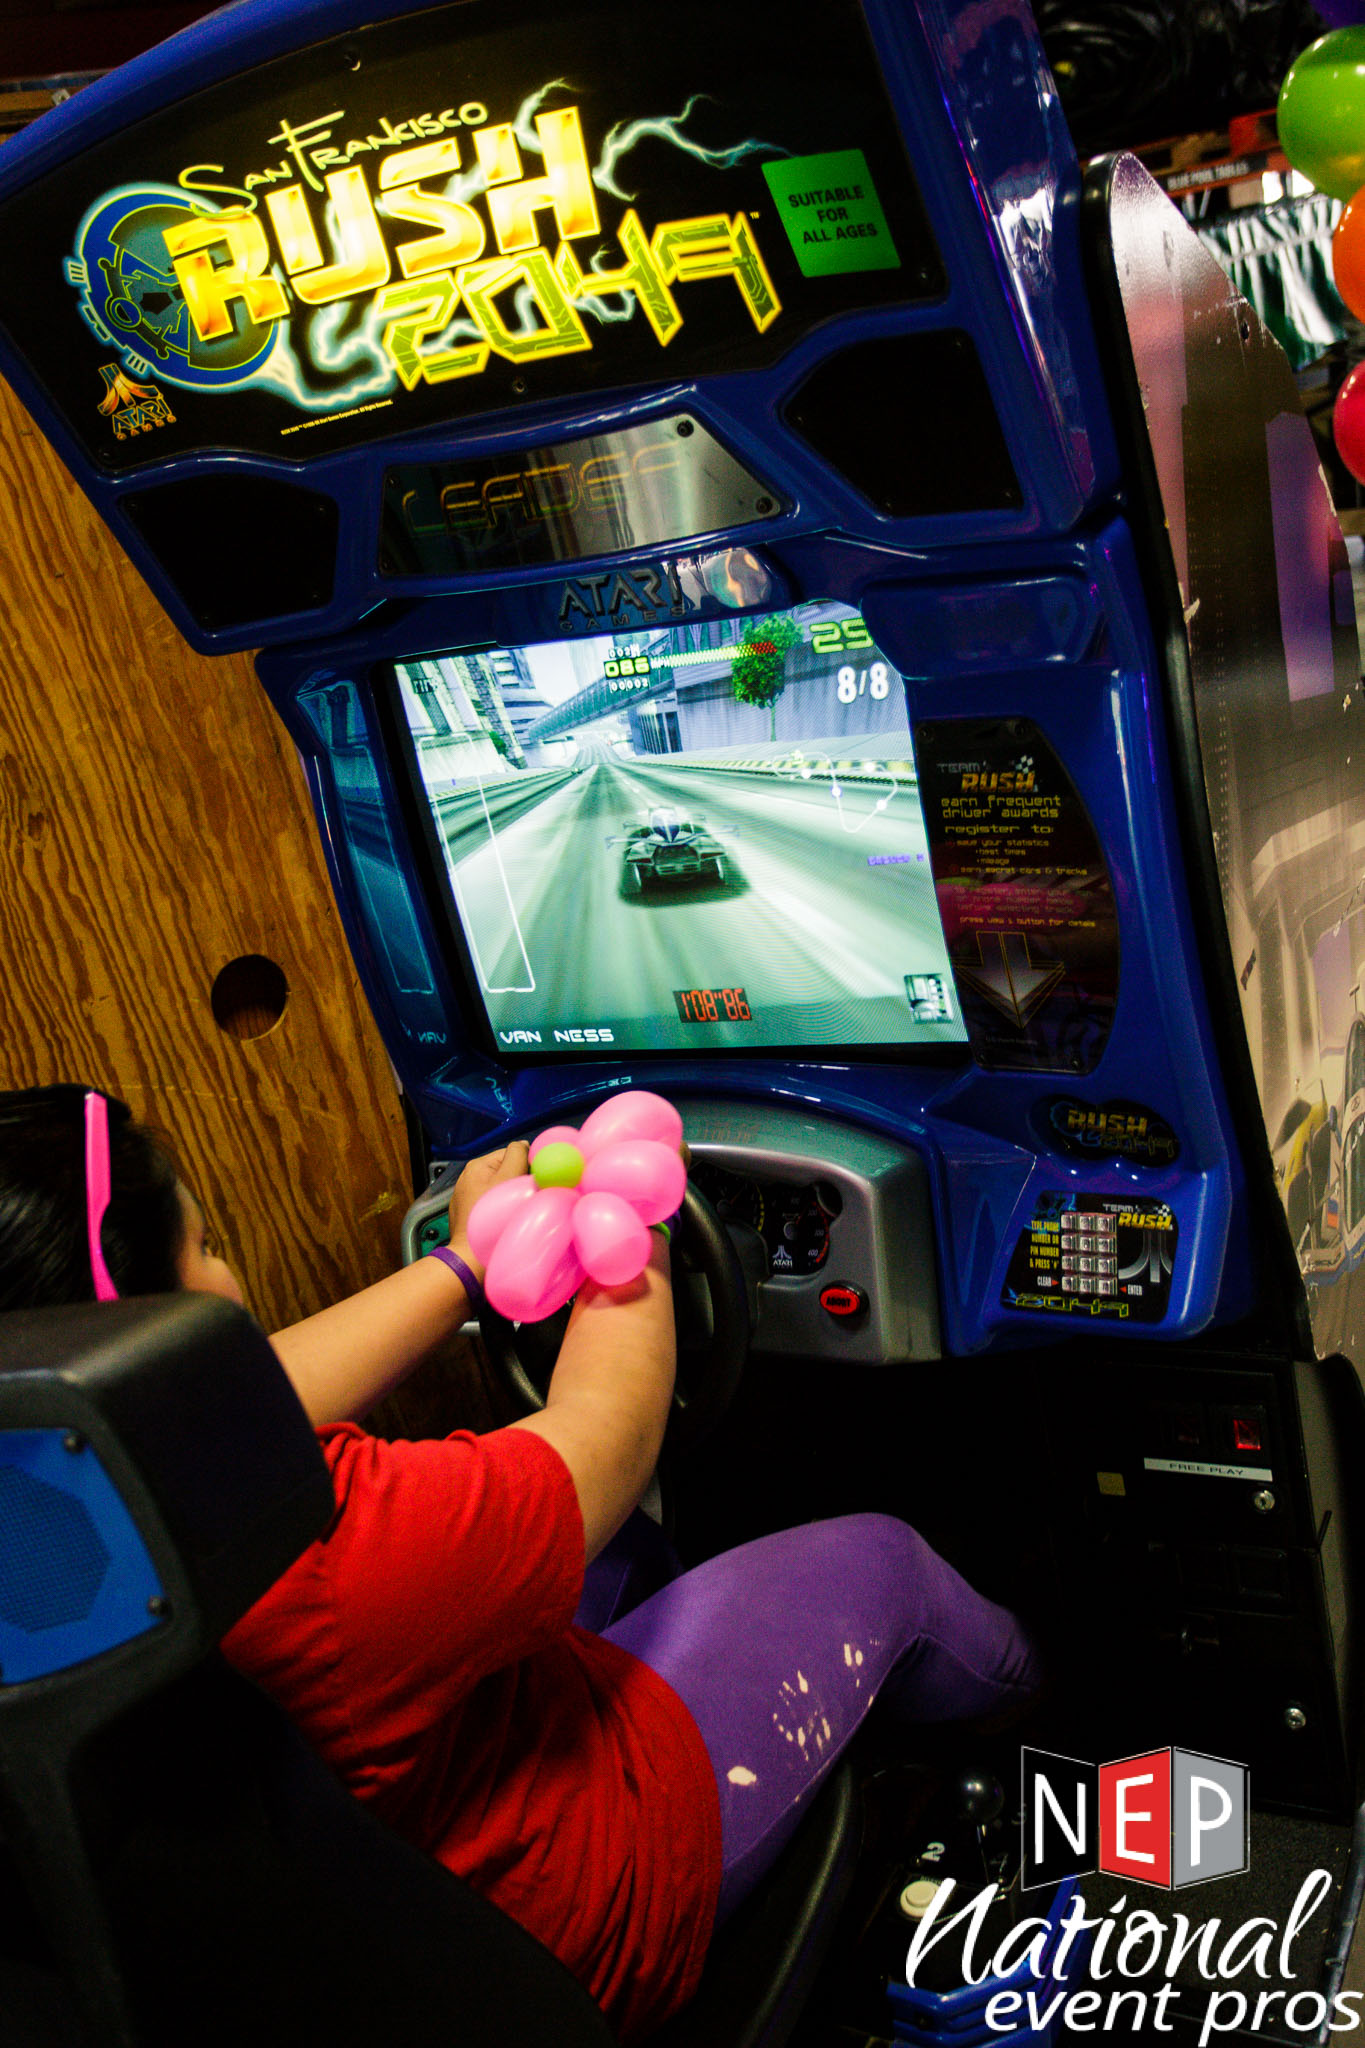 san francisco rush 2049 arcade driving game rental national event pros. Black Bedroom Furniture Sets. Home Design Ideas